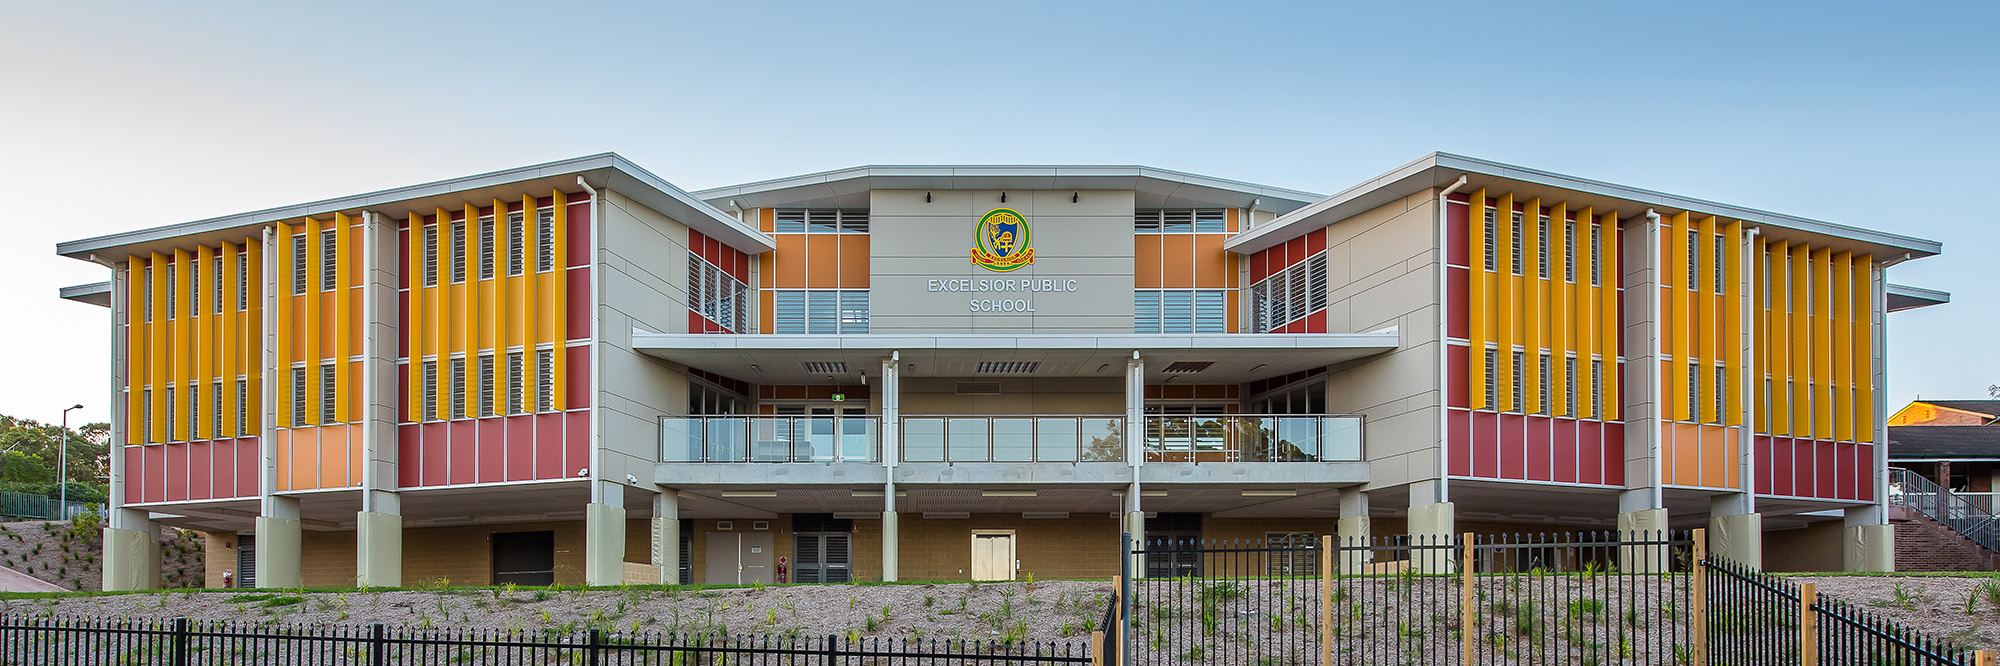 Excelsior Public School Architecture Exterior – Gardner Wetherill GW 4